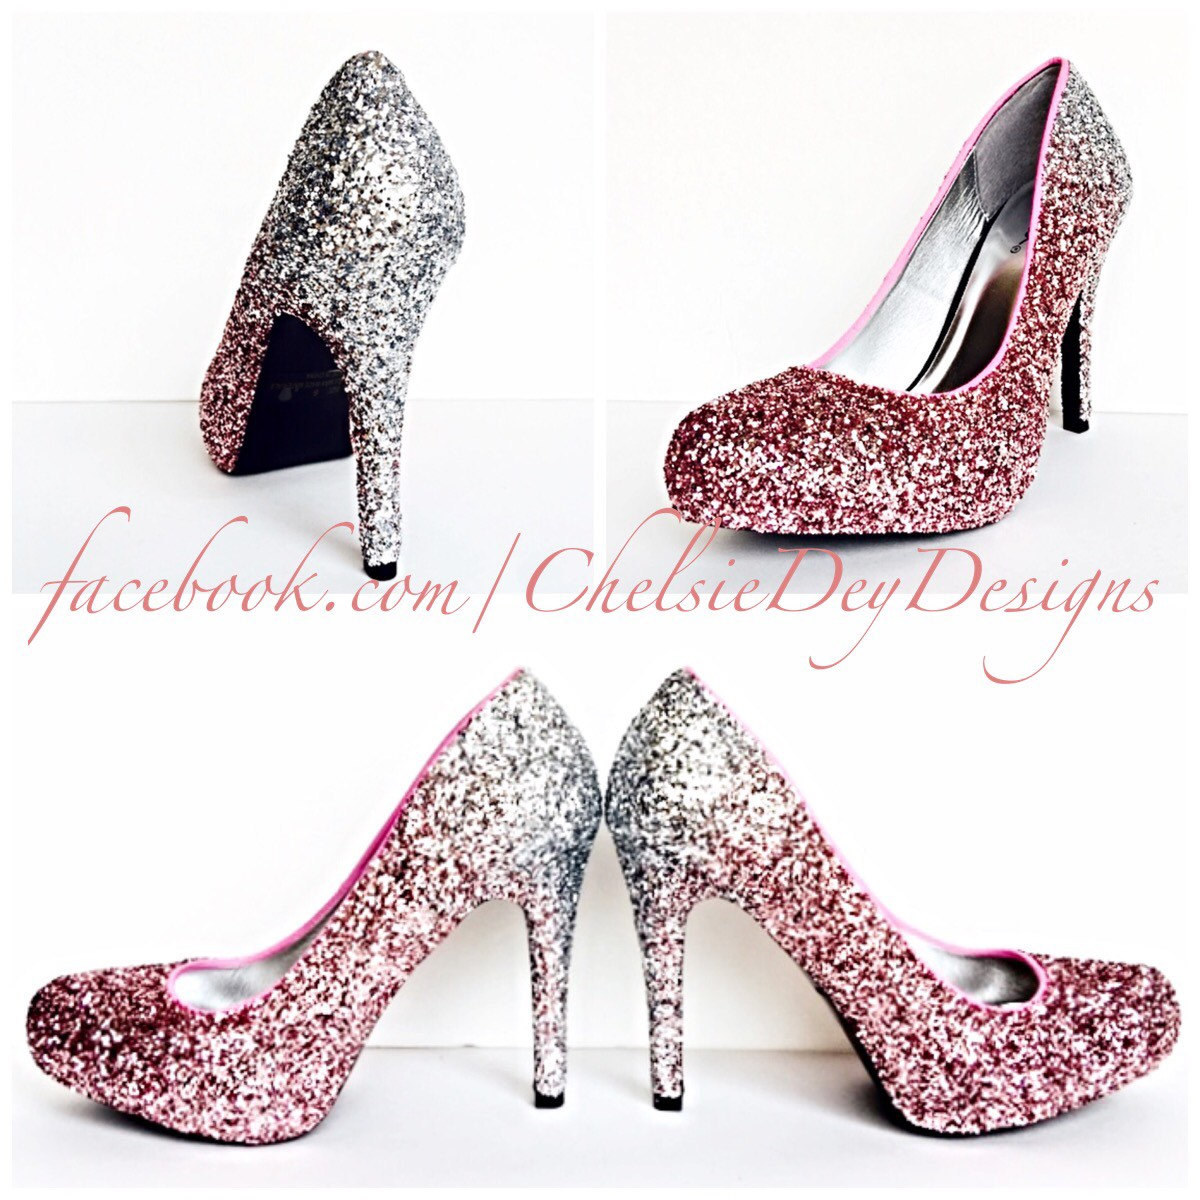 9cbec4b69400 Glitter High Heels - Silver Pink Pumps - Light Pink Silver Ombre Platform  Pumps - Sparkly